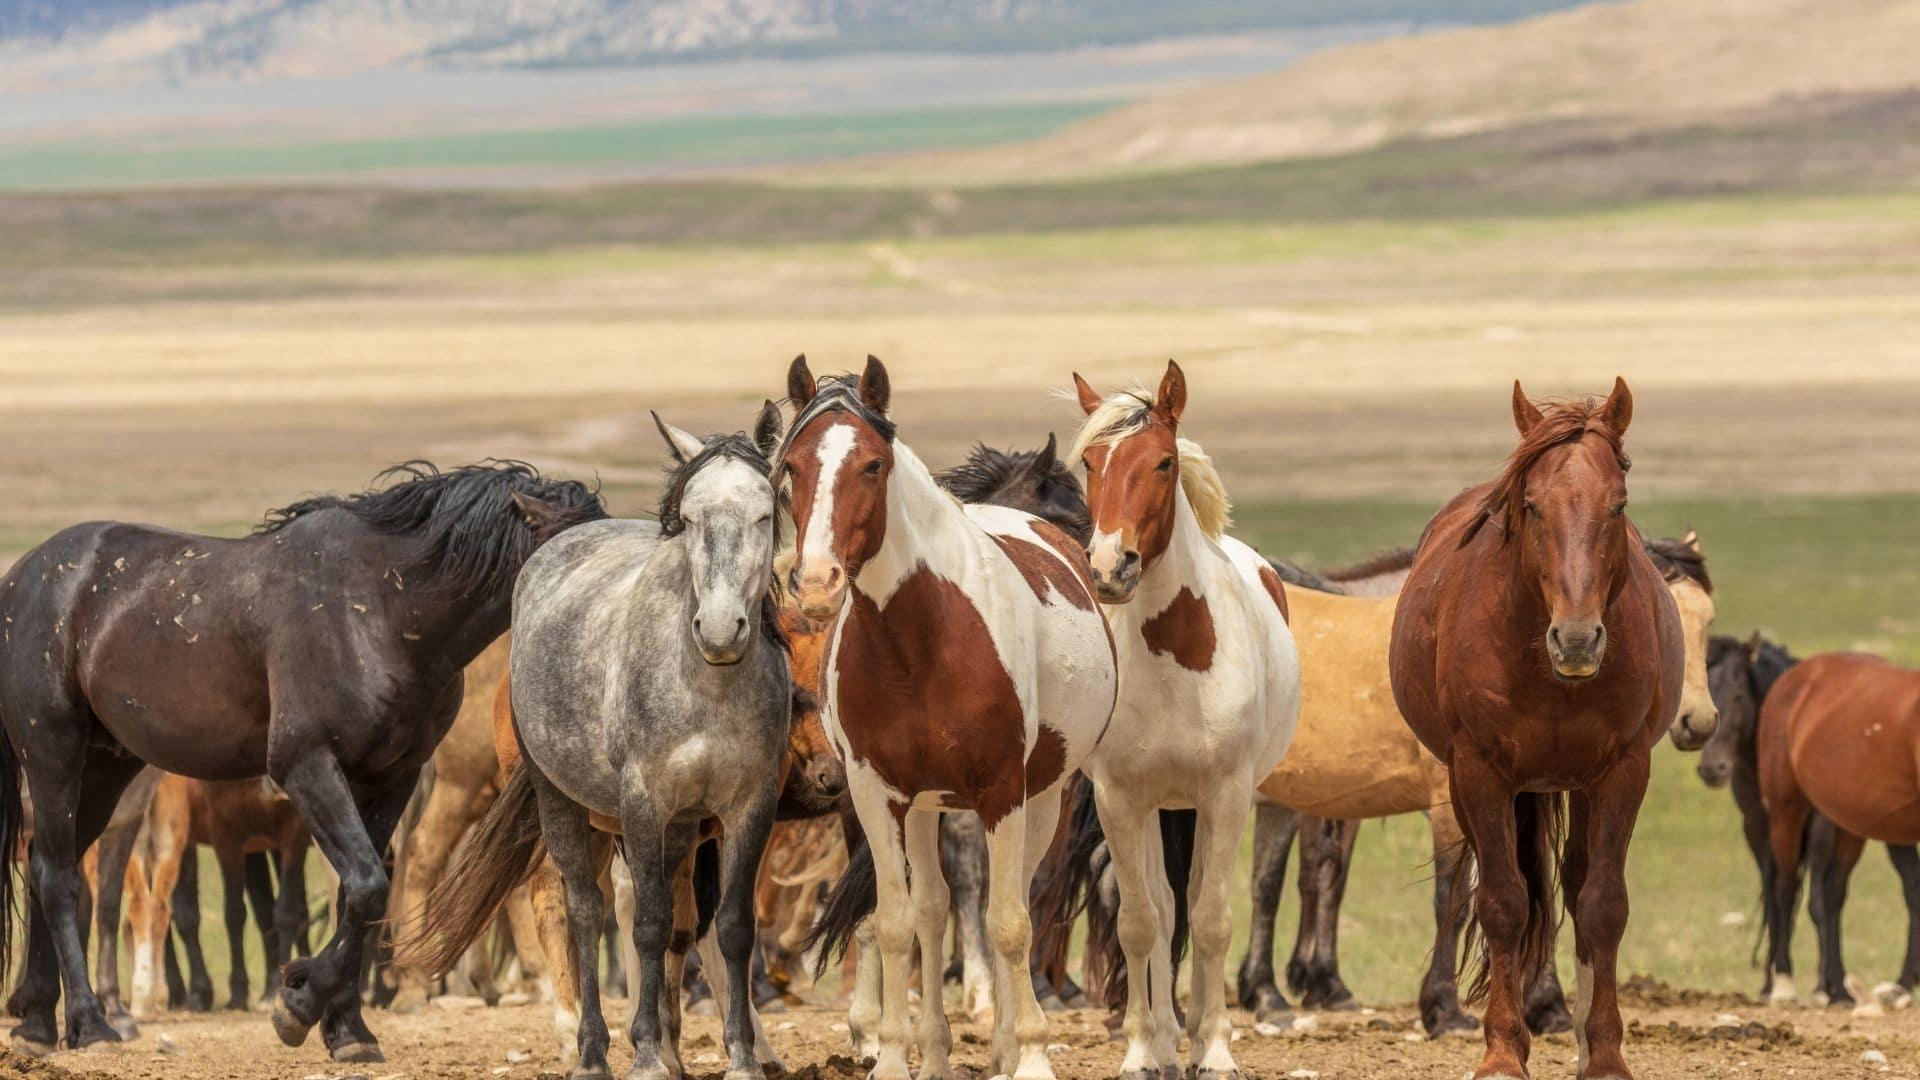 Are wild horses dangerous